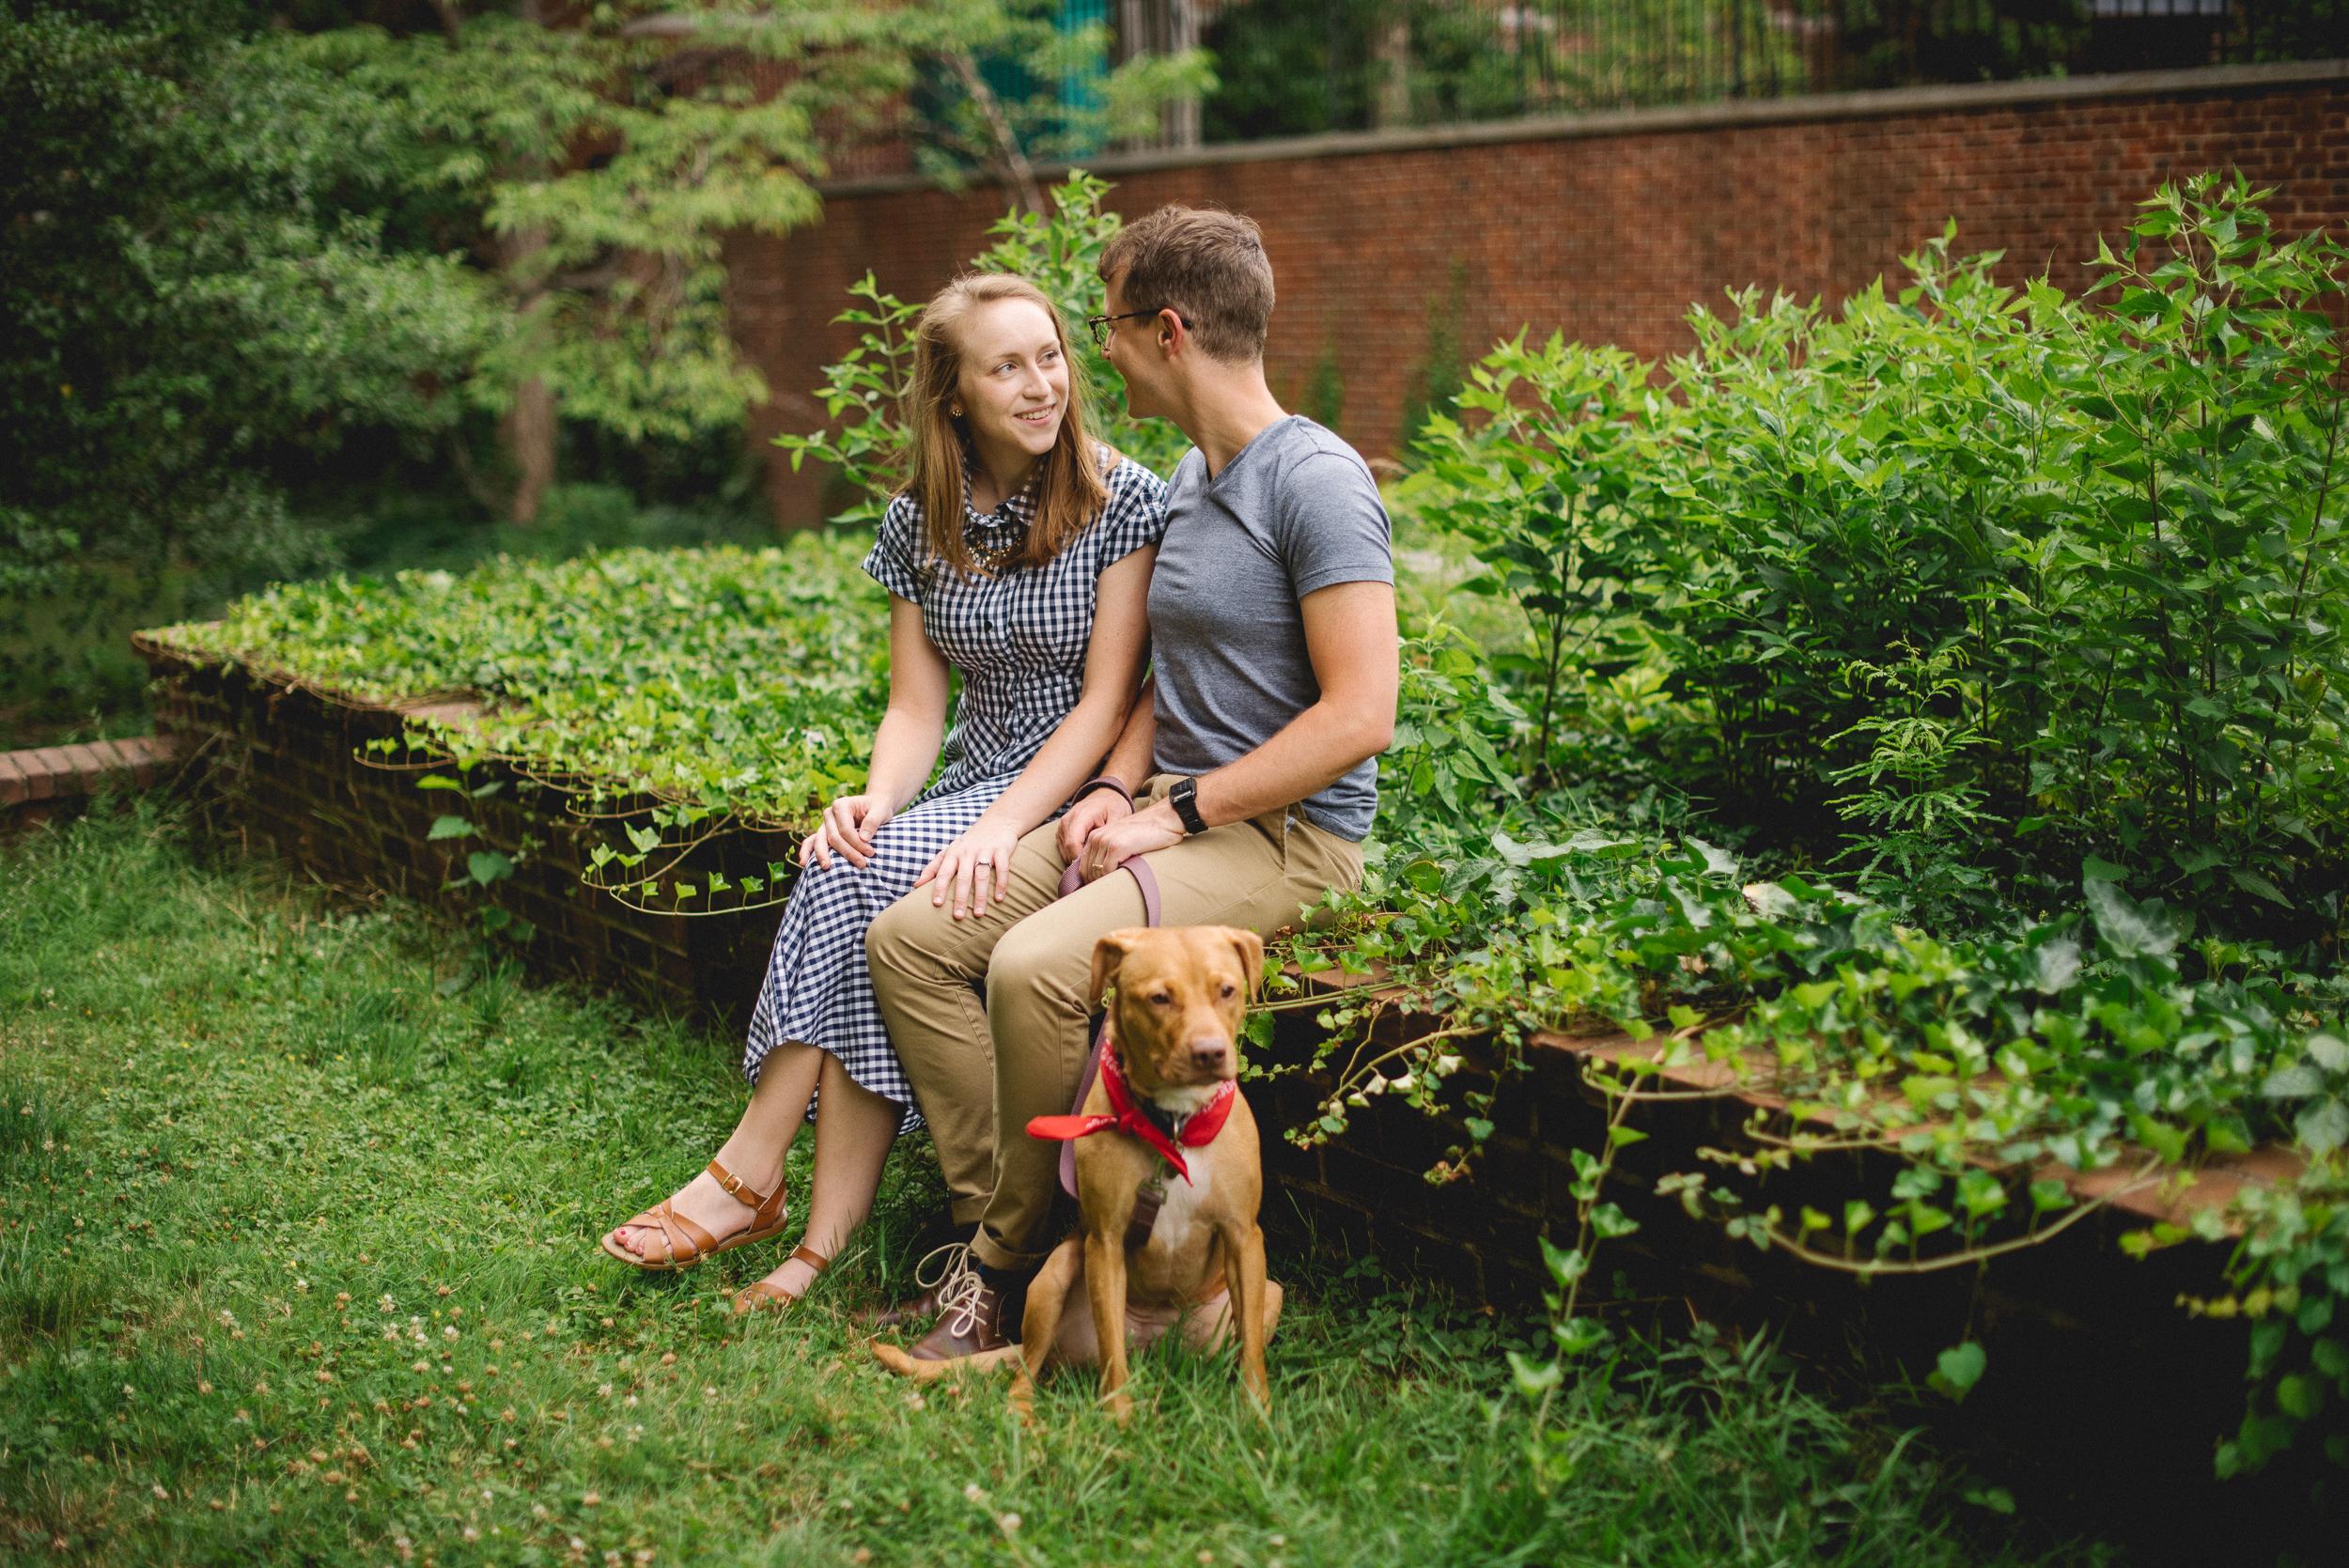 Peaberry-Photography-Society-Hill-Philadelphia-Pennsylvania-Newlyweds-Just-Married-011.jpg